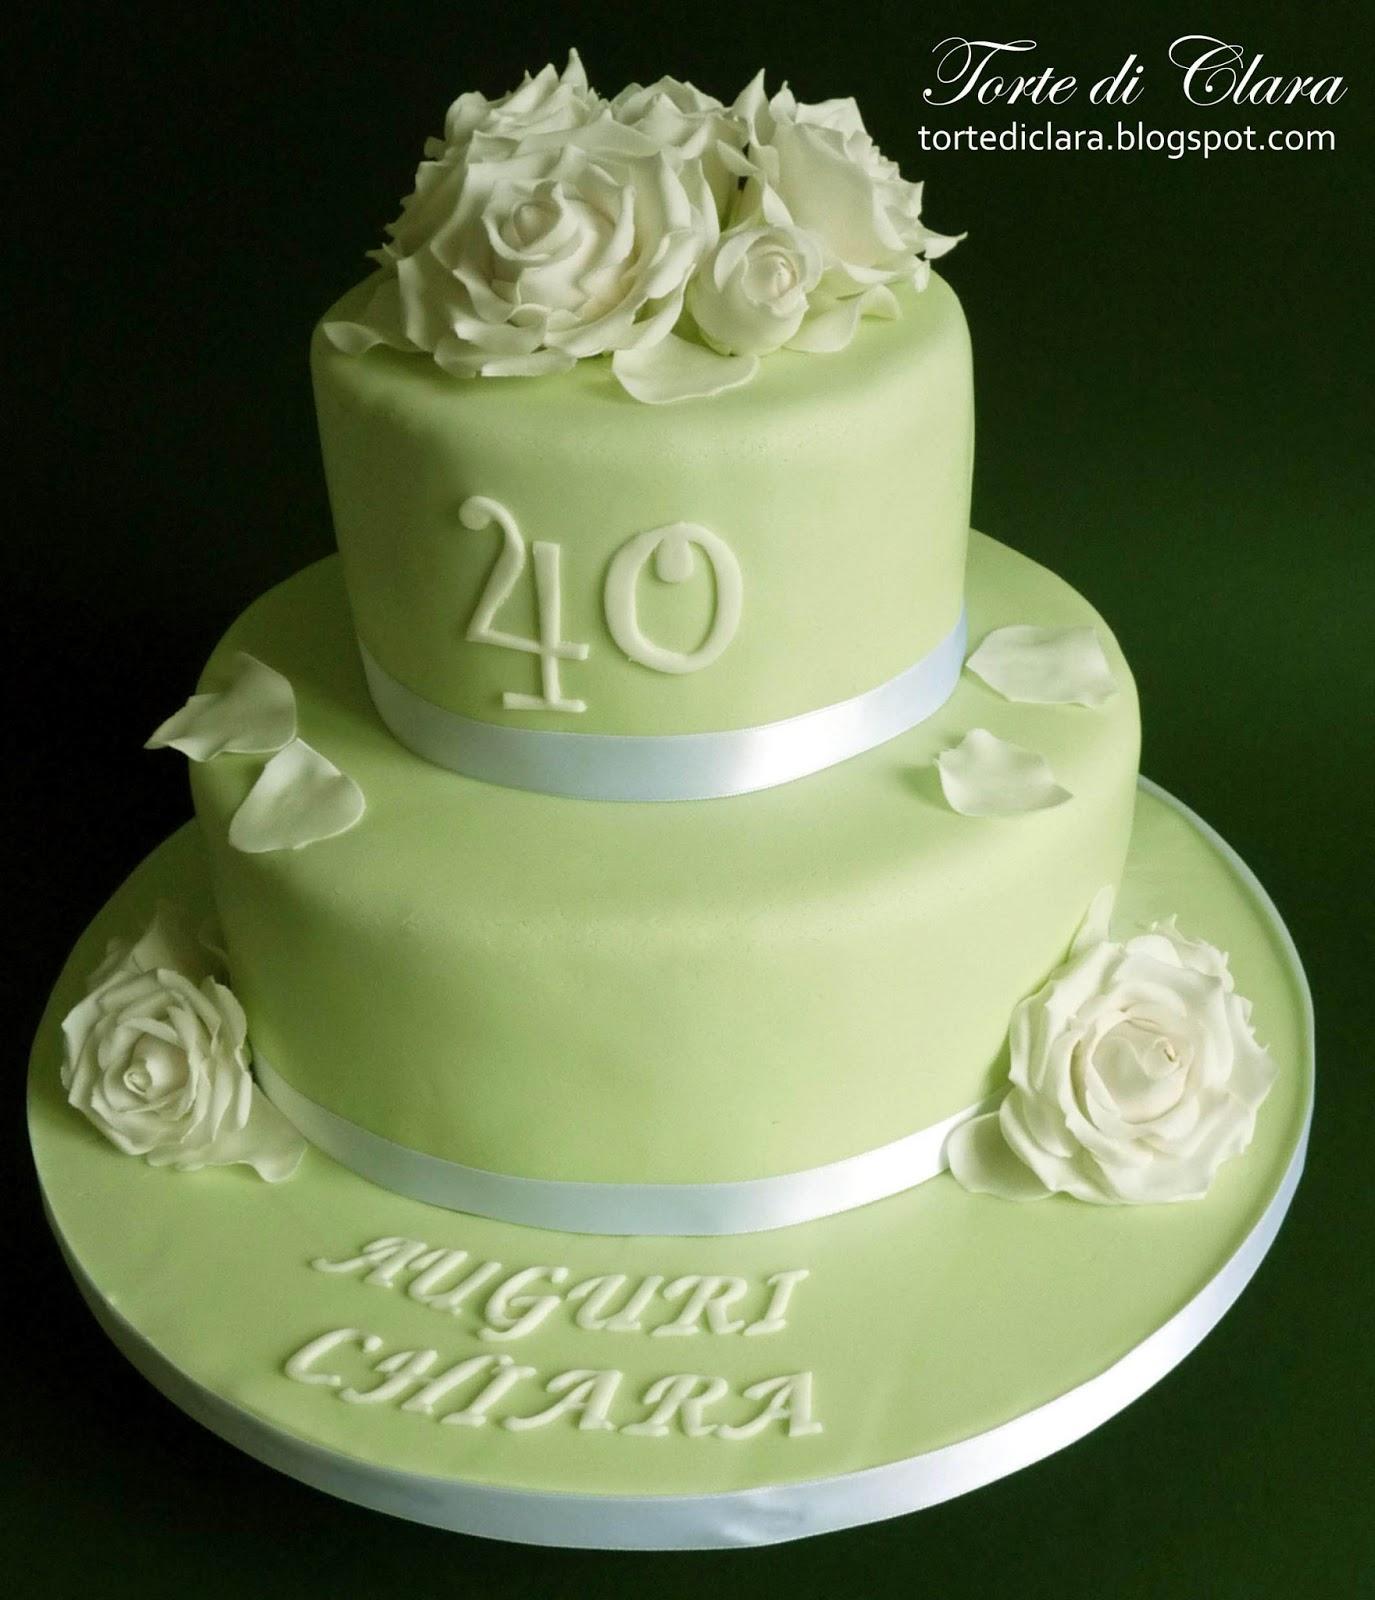 Molto Torte di Clara: Rose cake (11) RD41